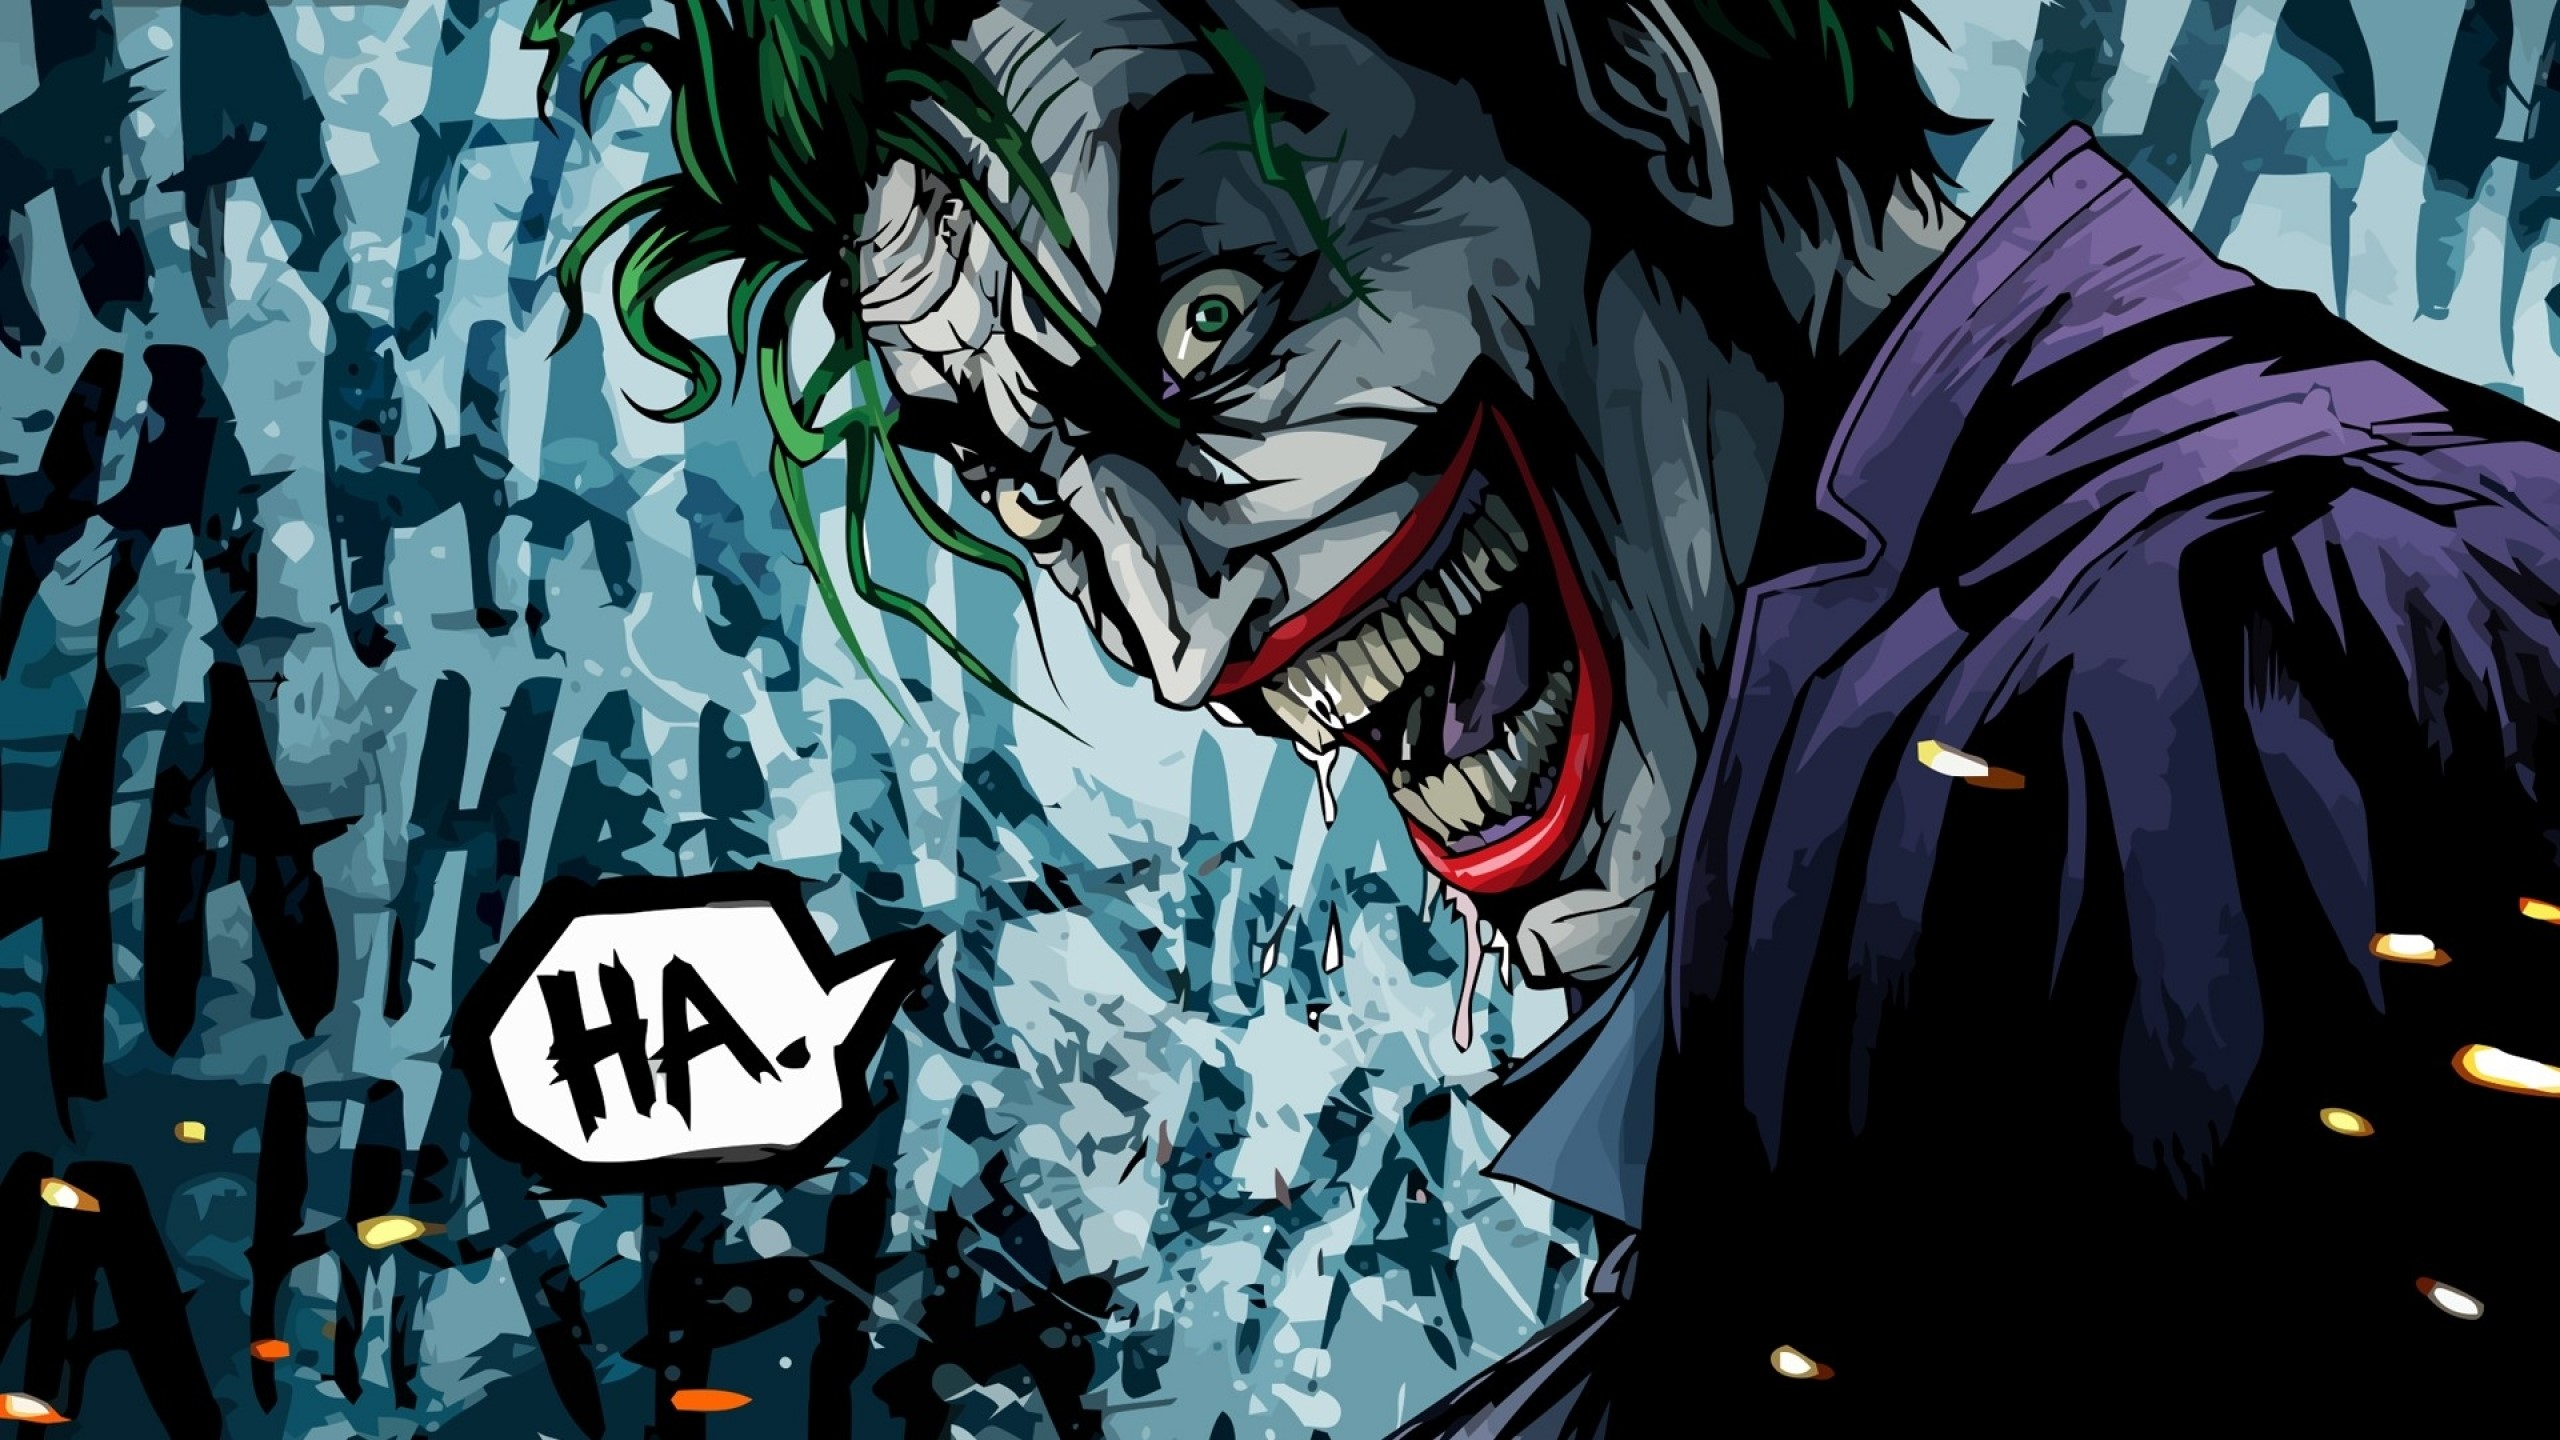 Wallpaper Joker - Guason Comic Images